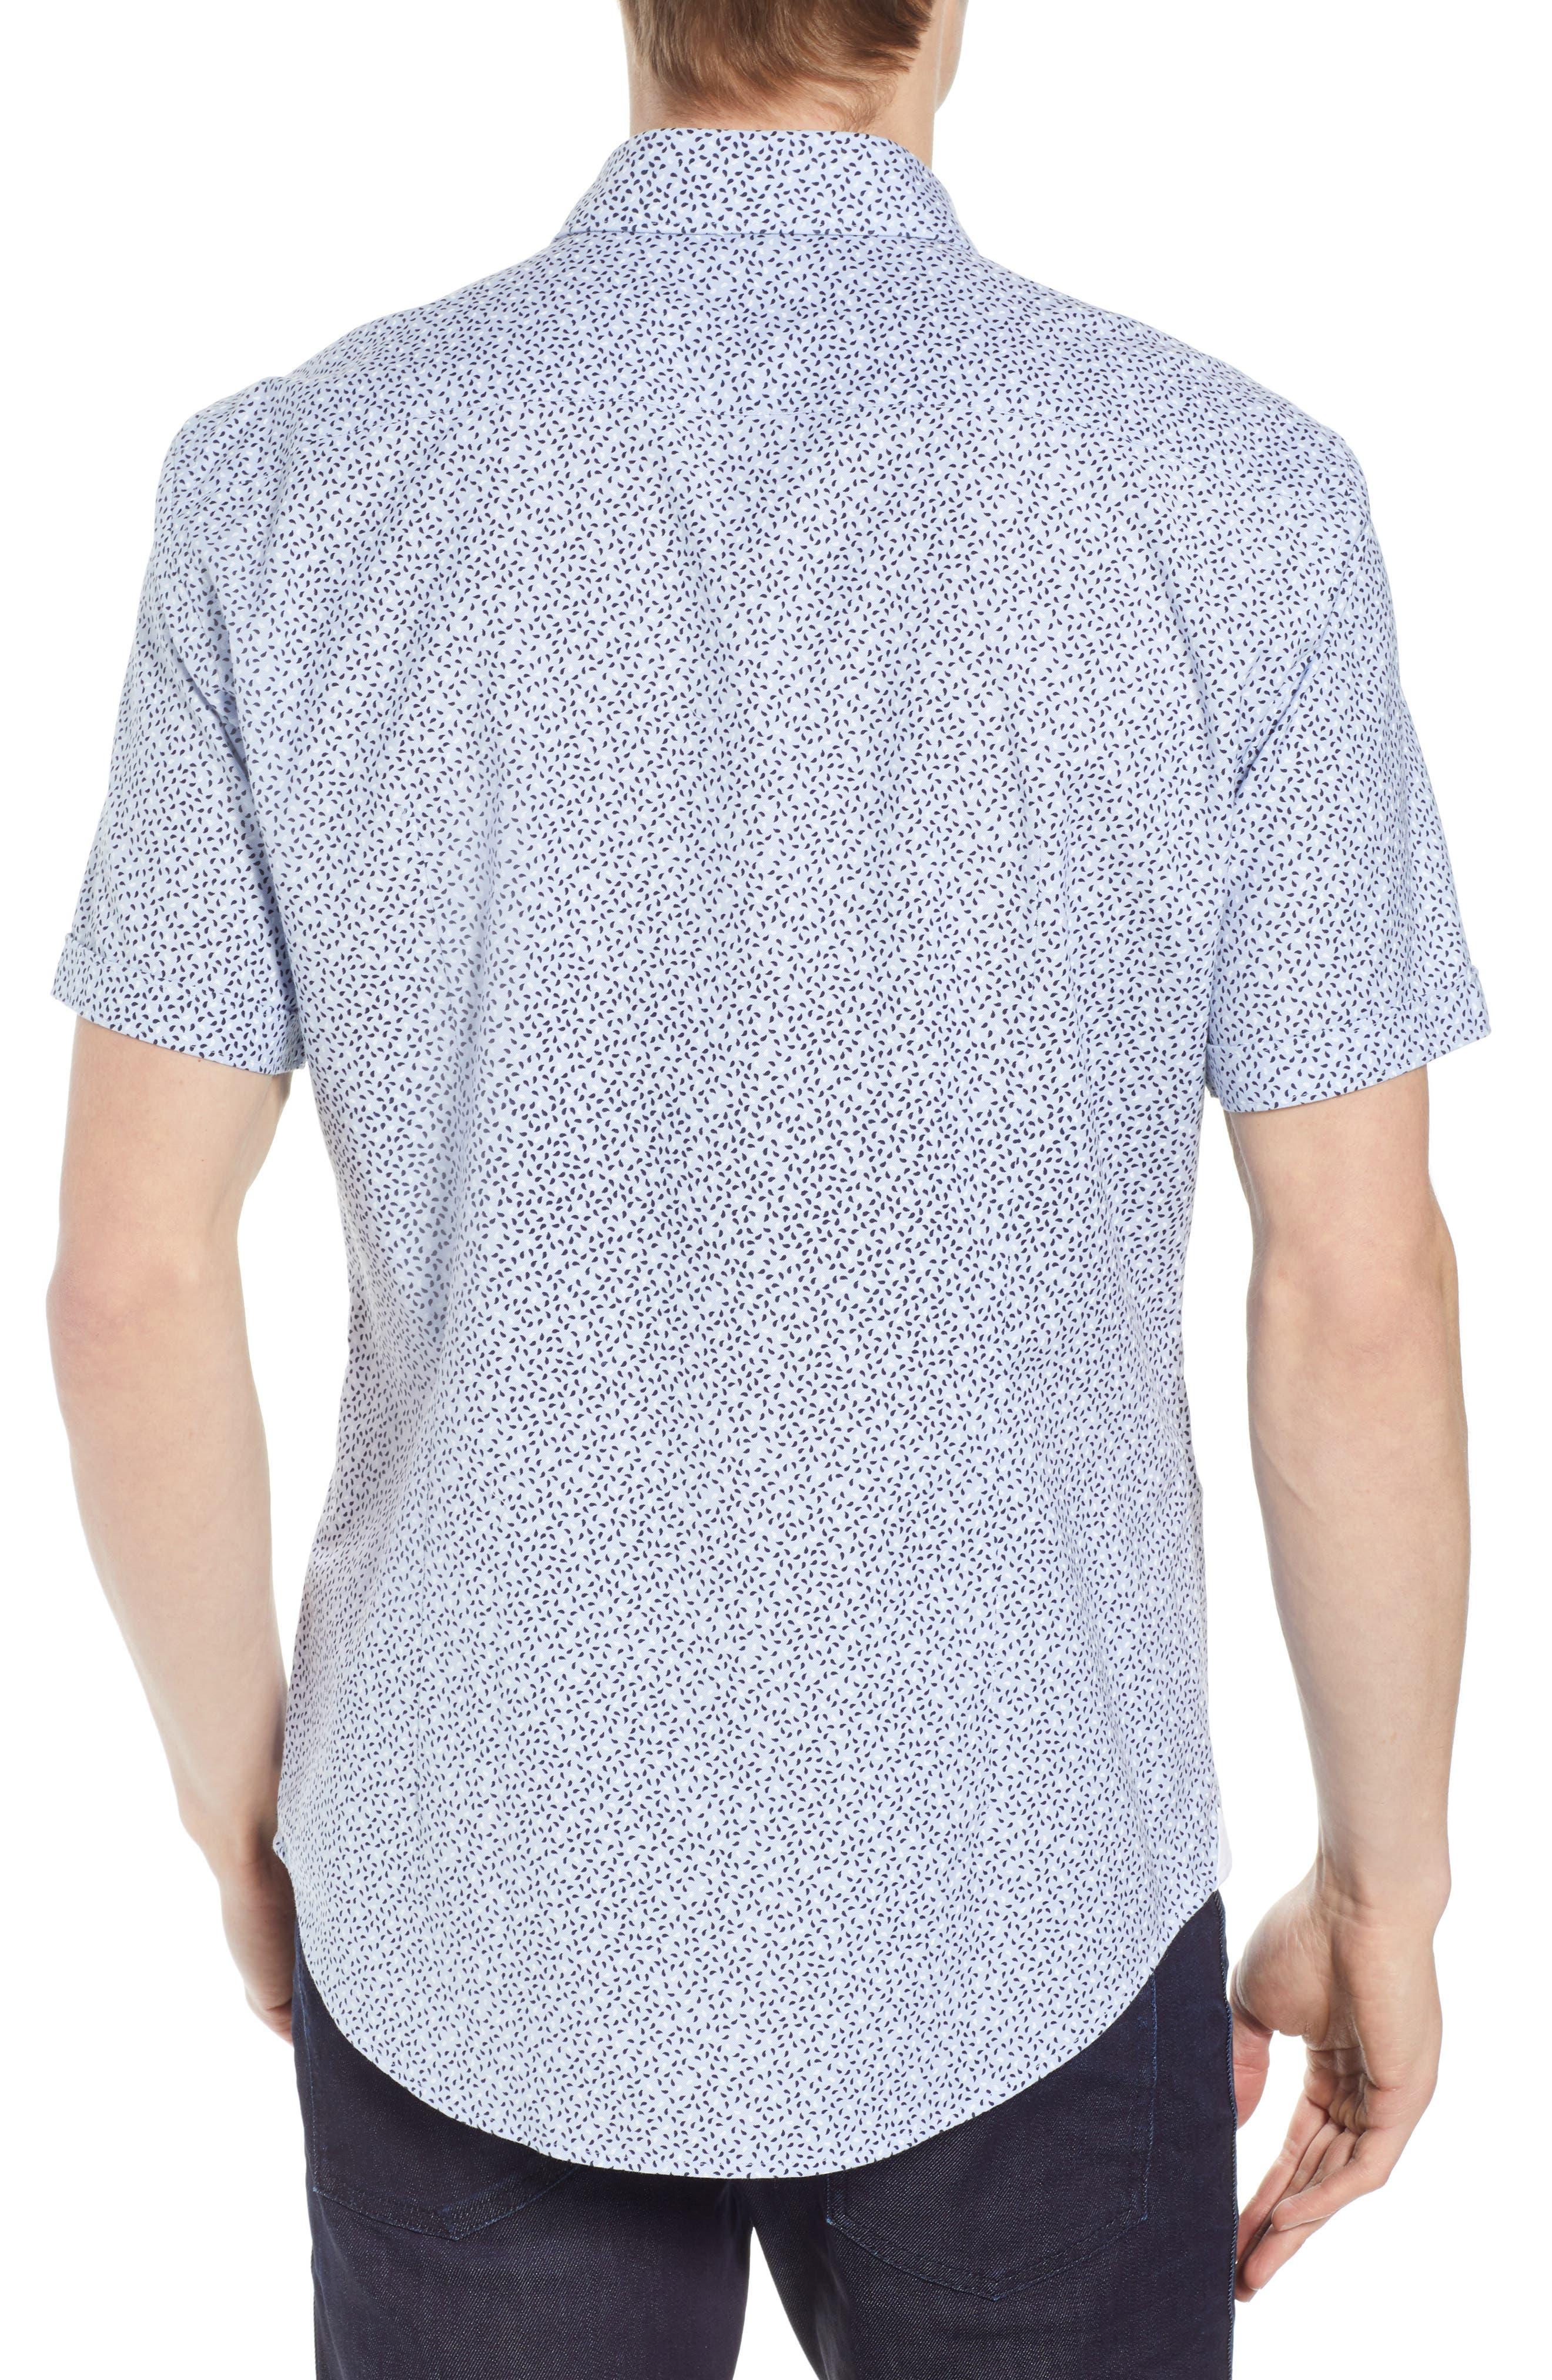 Robb Trim Fit Paisley Sport Shirt,                             Alternate thumbnail 3, color,                             Blue